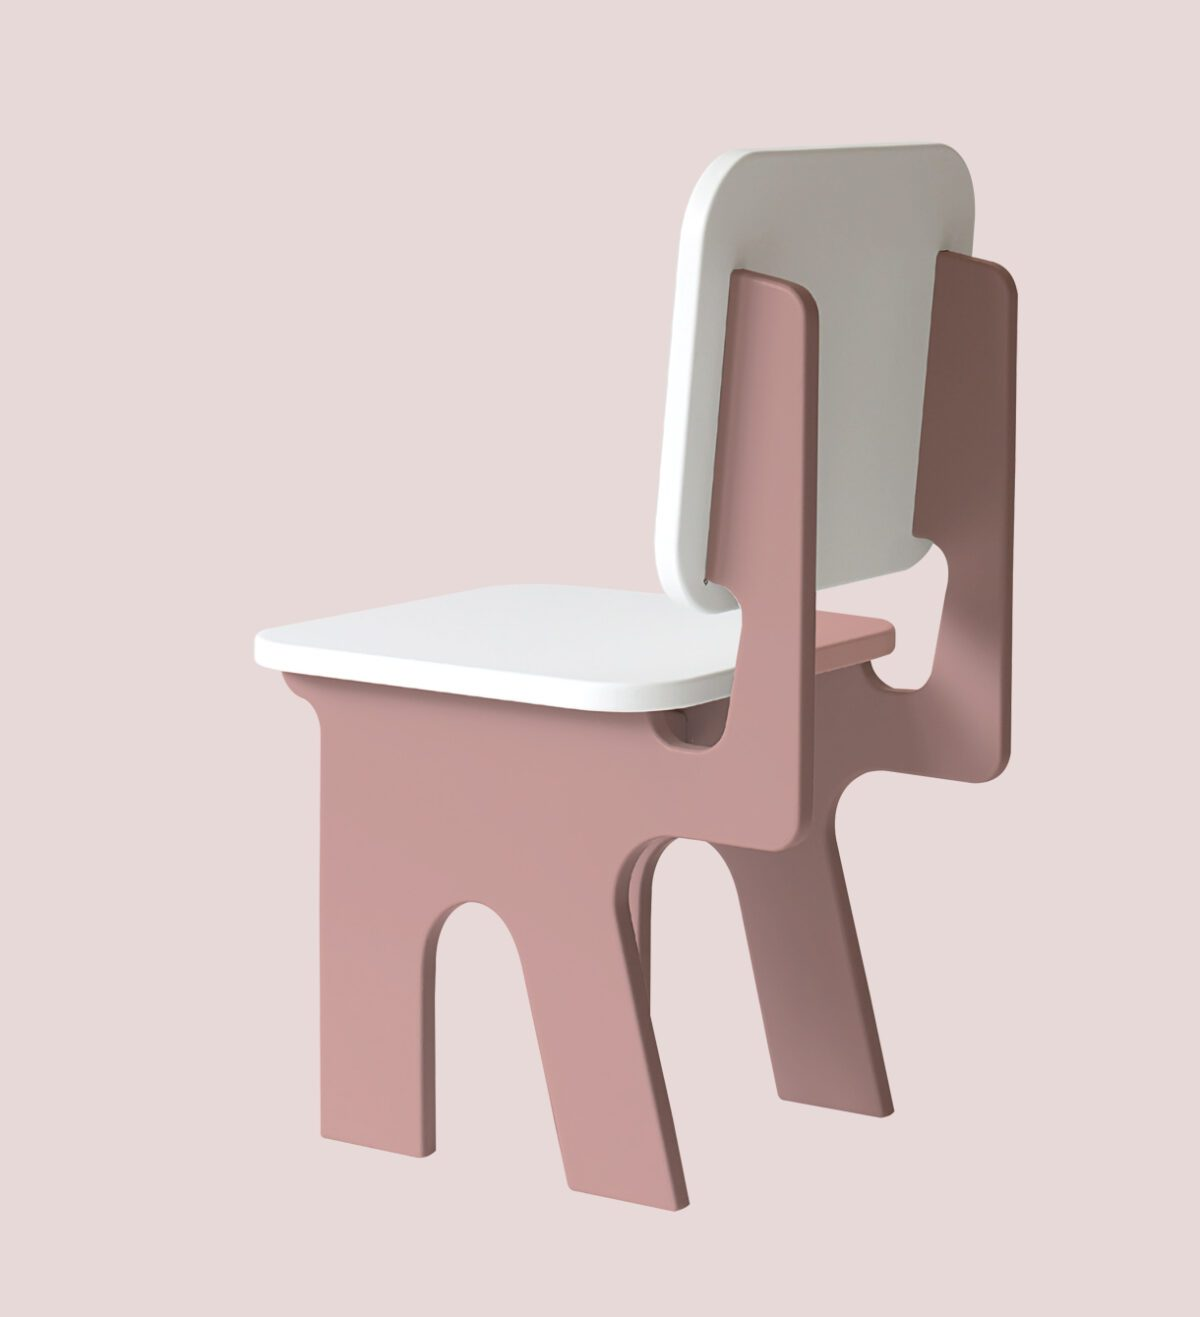 Kinderstoel roze Dipperdee Jindl